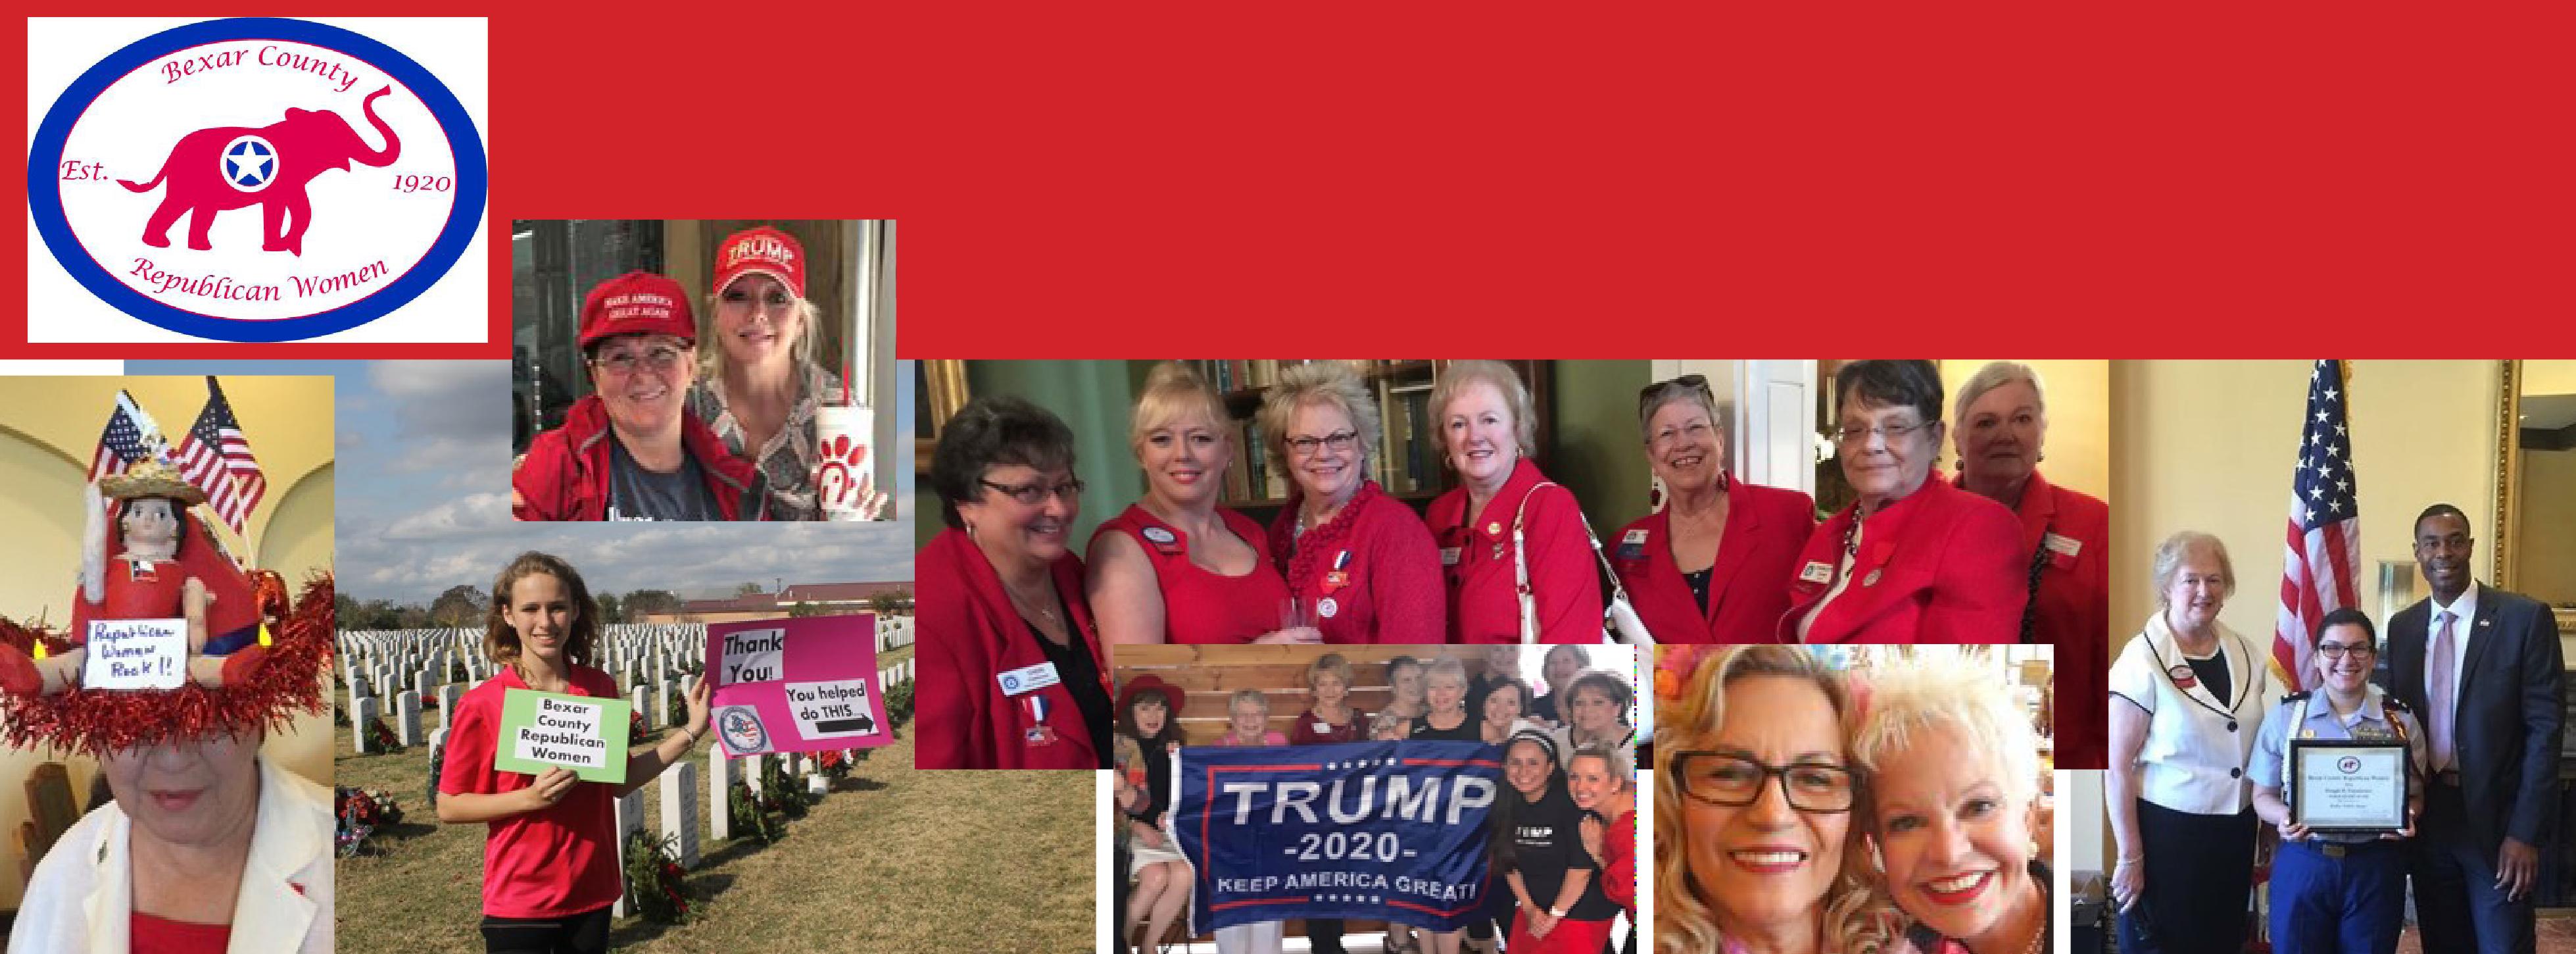 Bexar County Republican Women